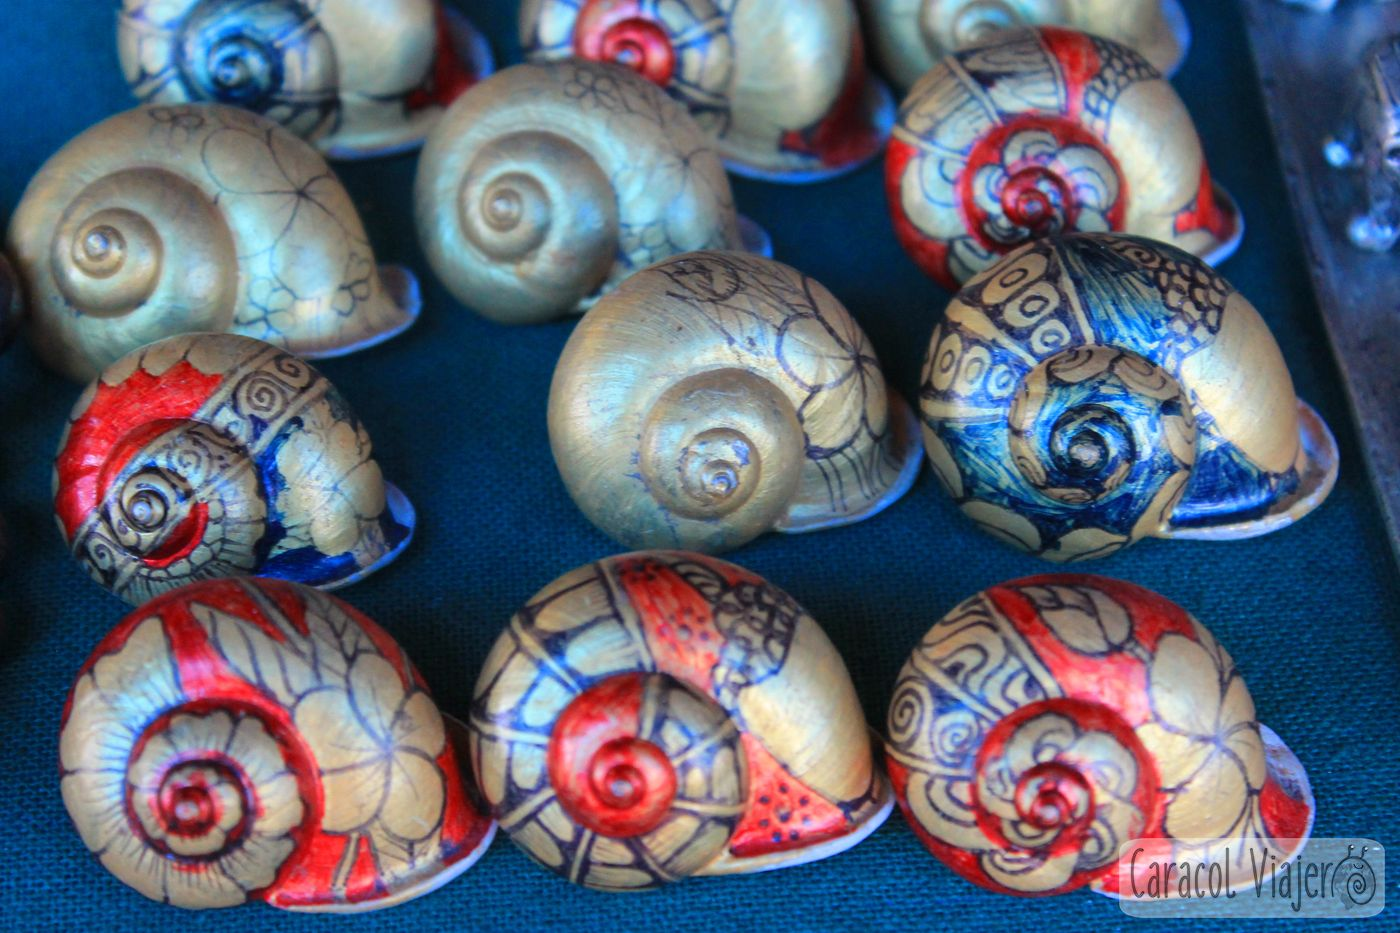 caracoles de colores Laos